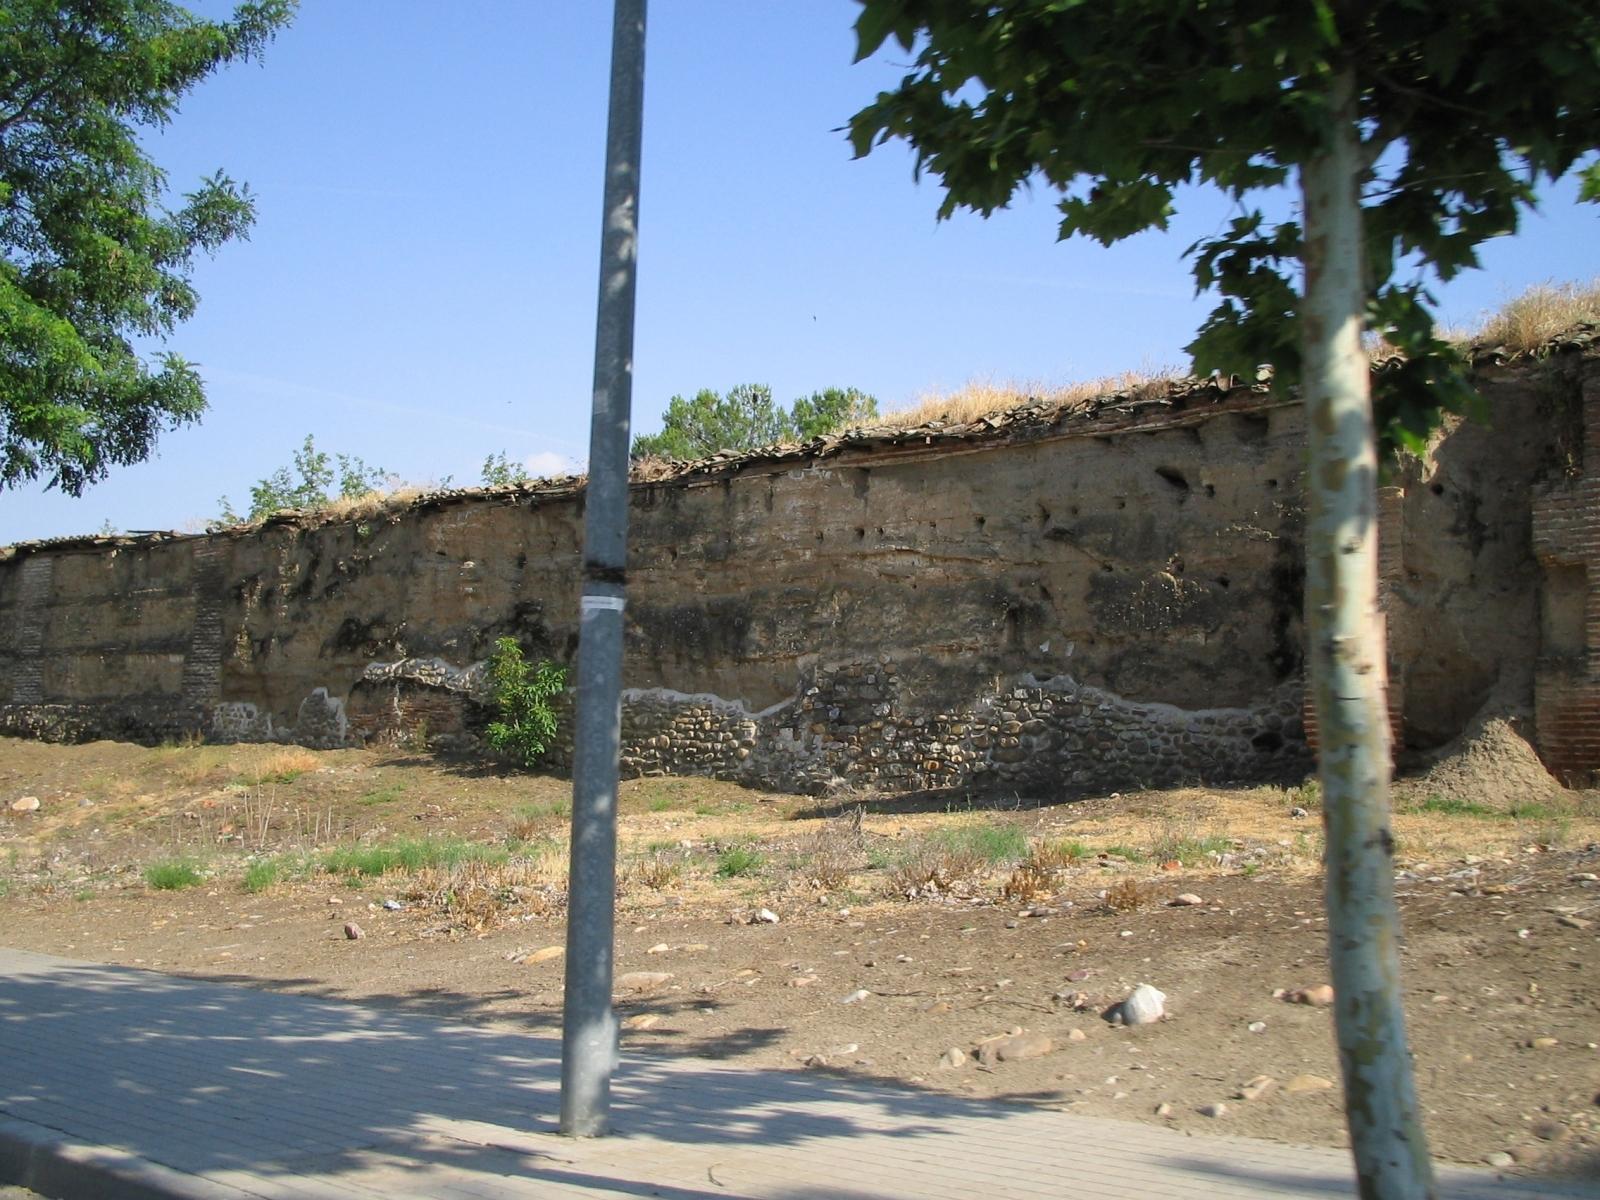 Talamanca de Jarama